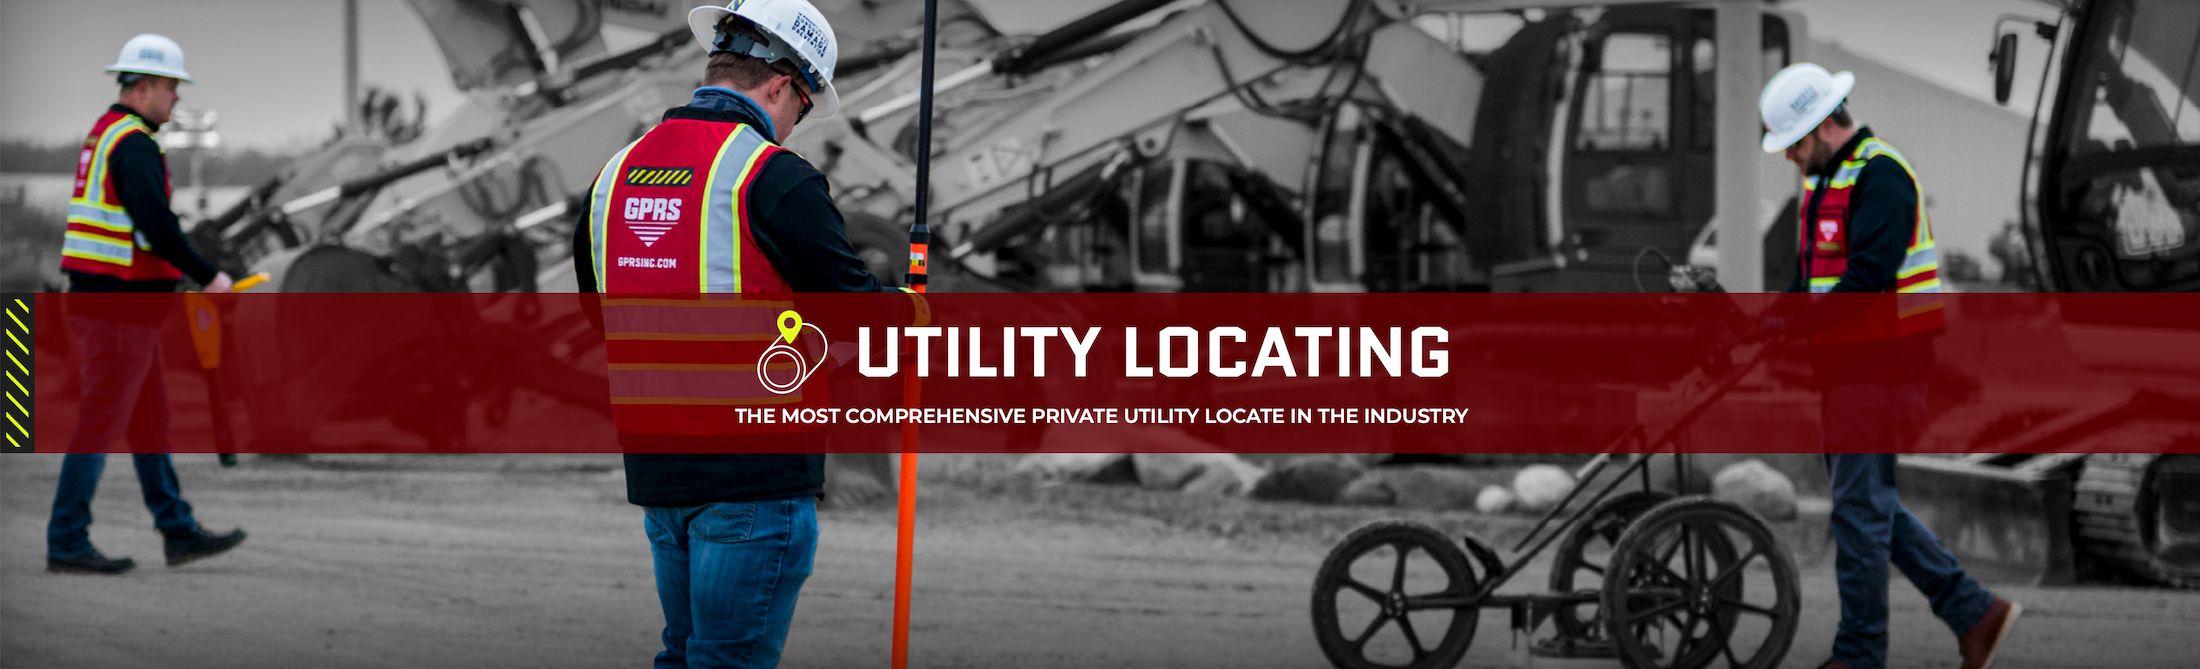 1-utility-locating.jpg